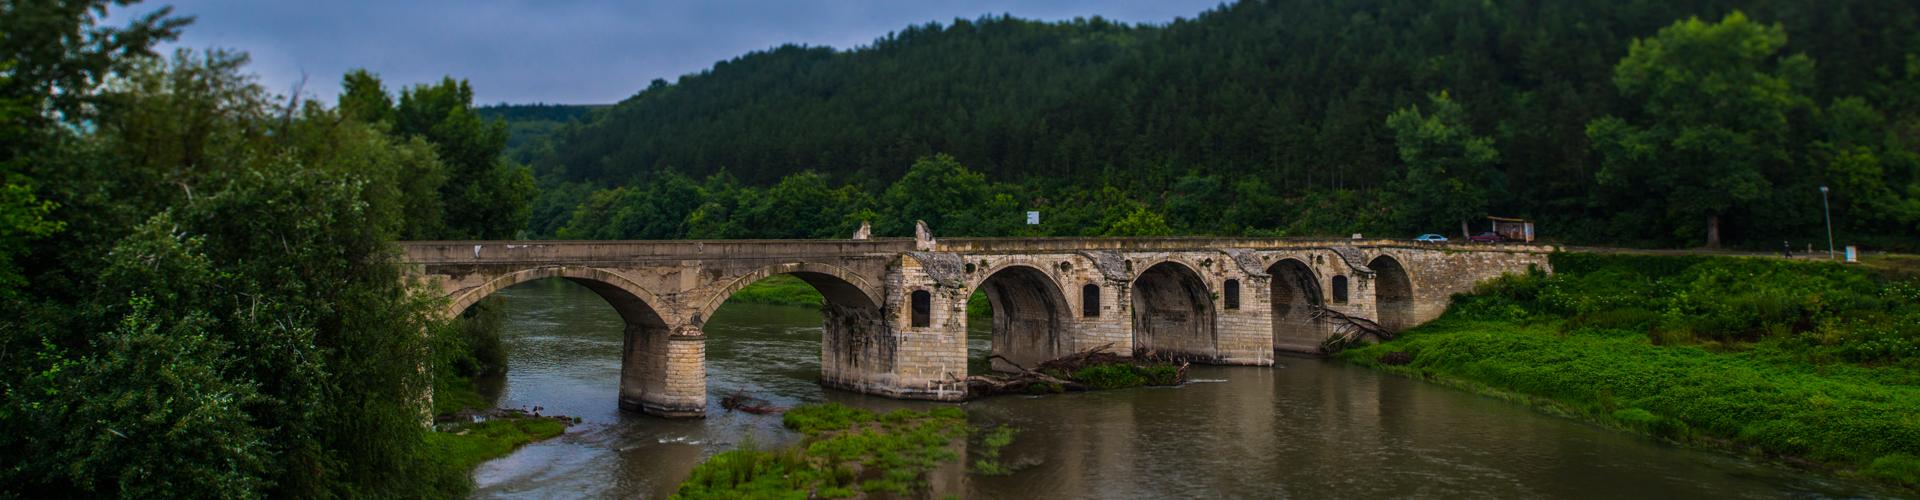 TransferTaxi-EUROPE   bridge-over-Yantra-River - TransferTaxi-EUROPE